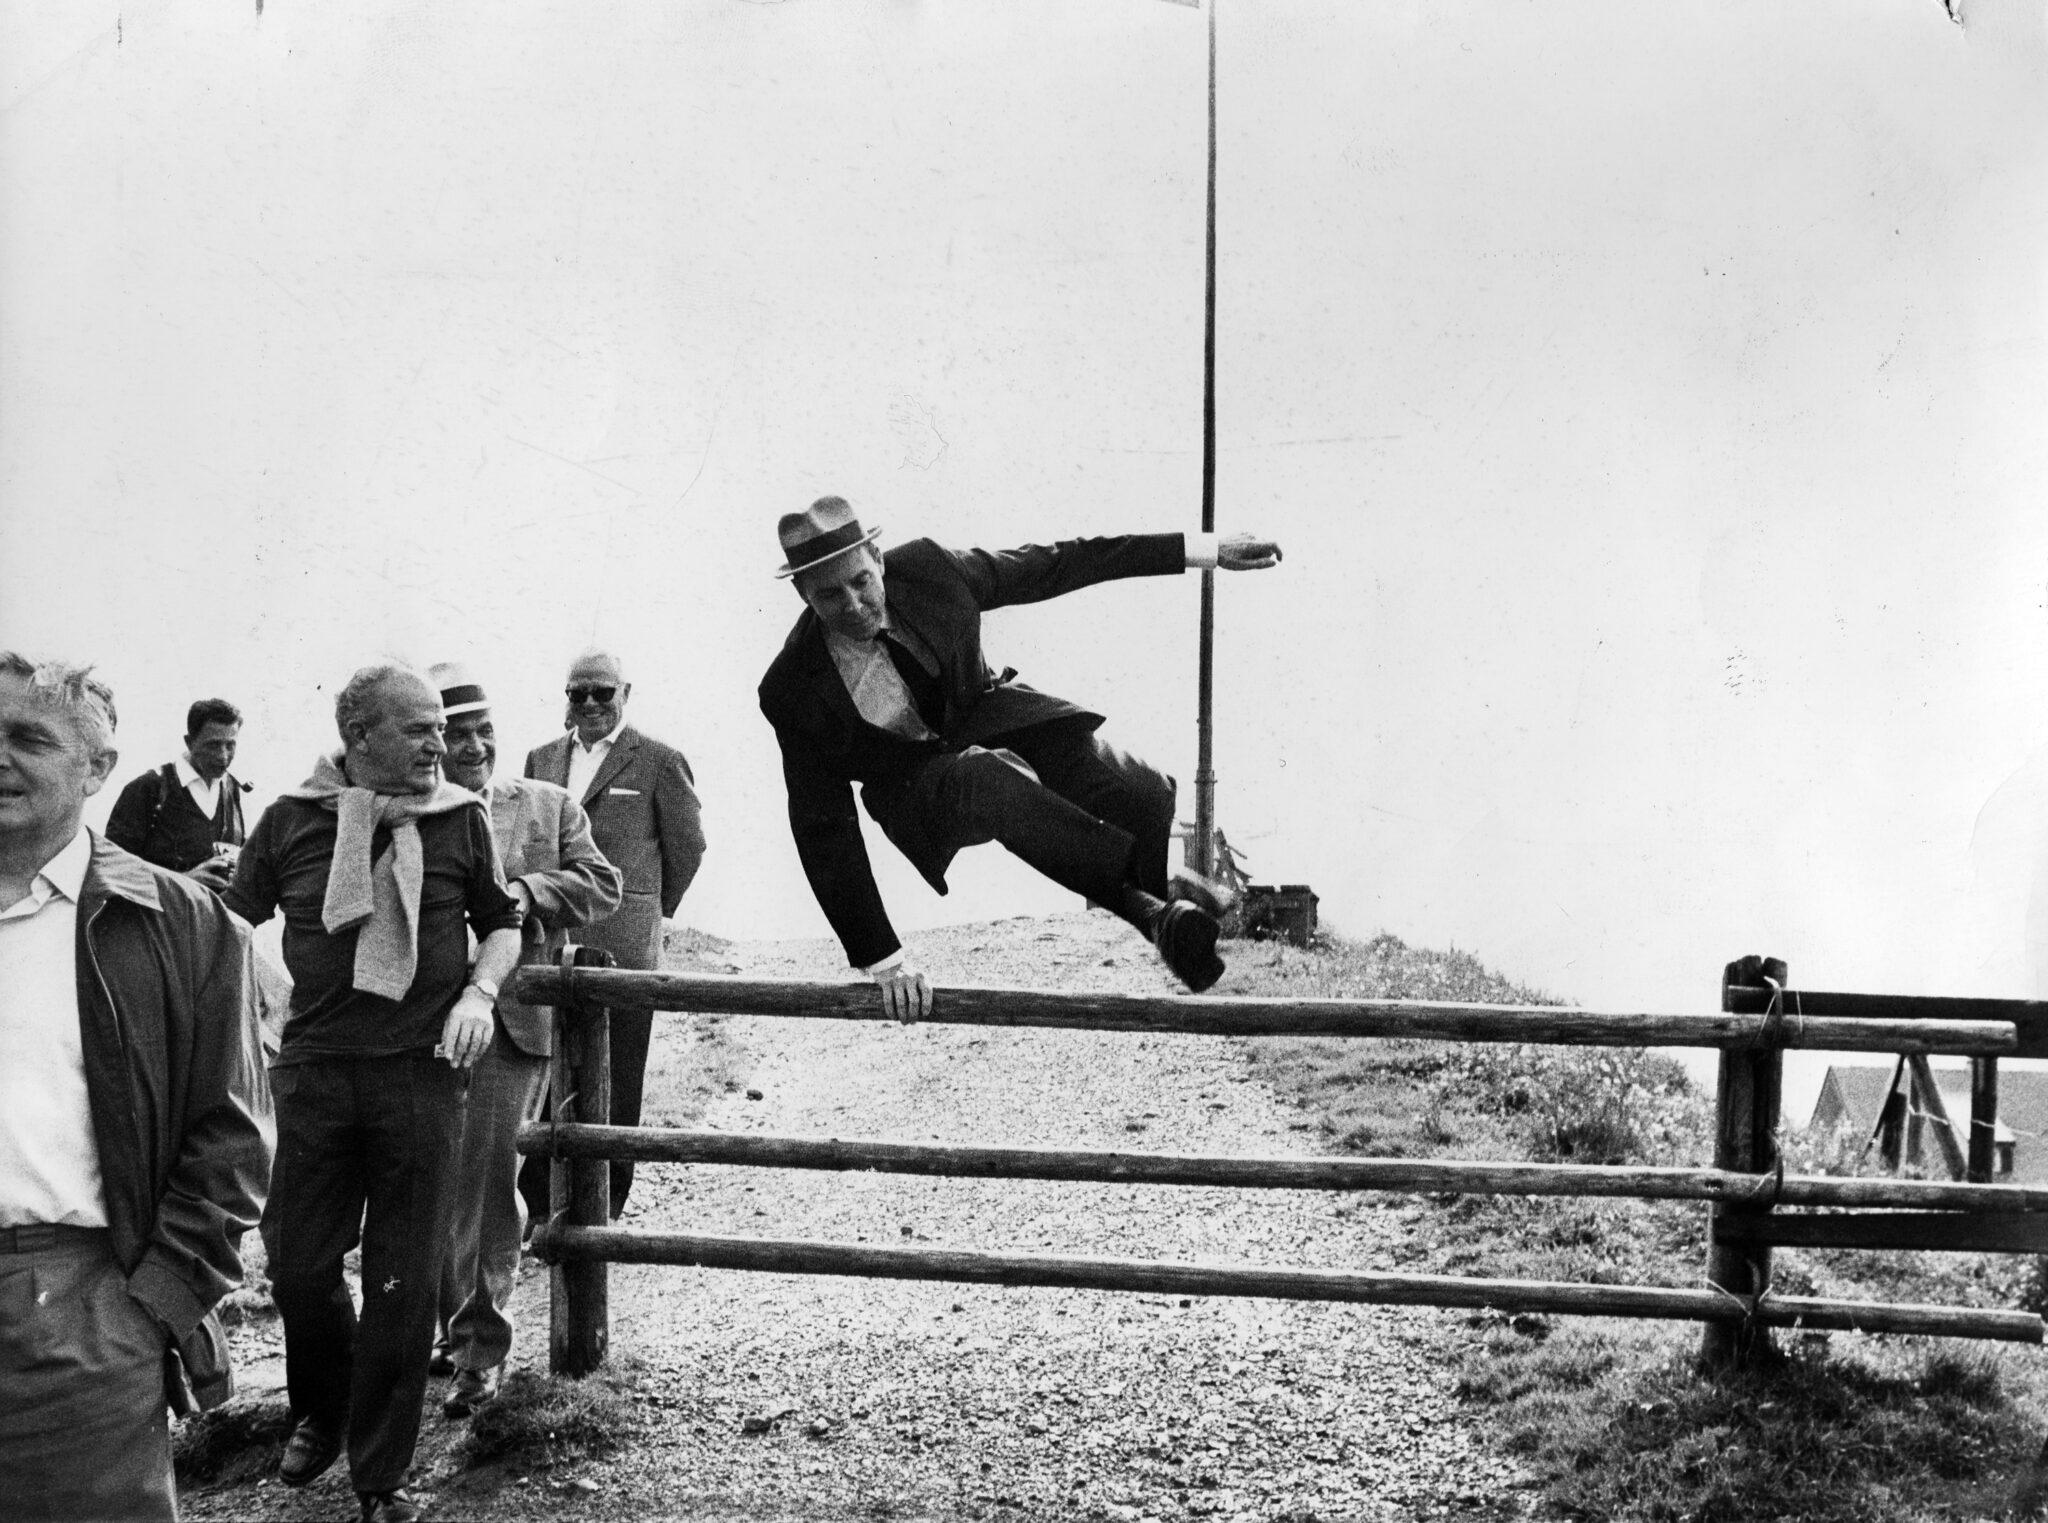 Mann hüpft über Zaun